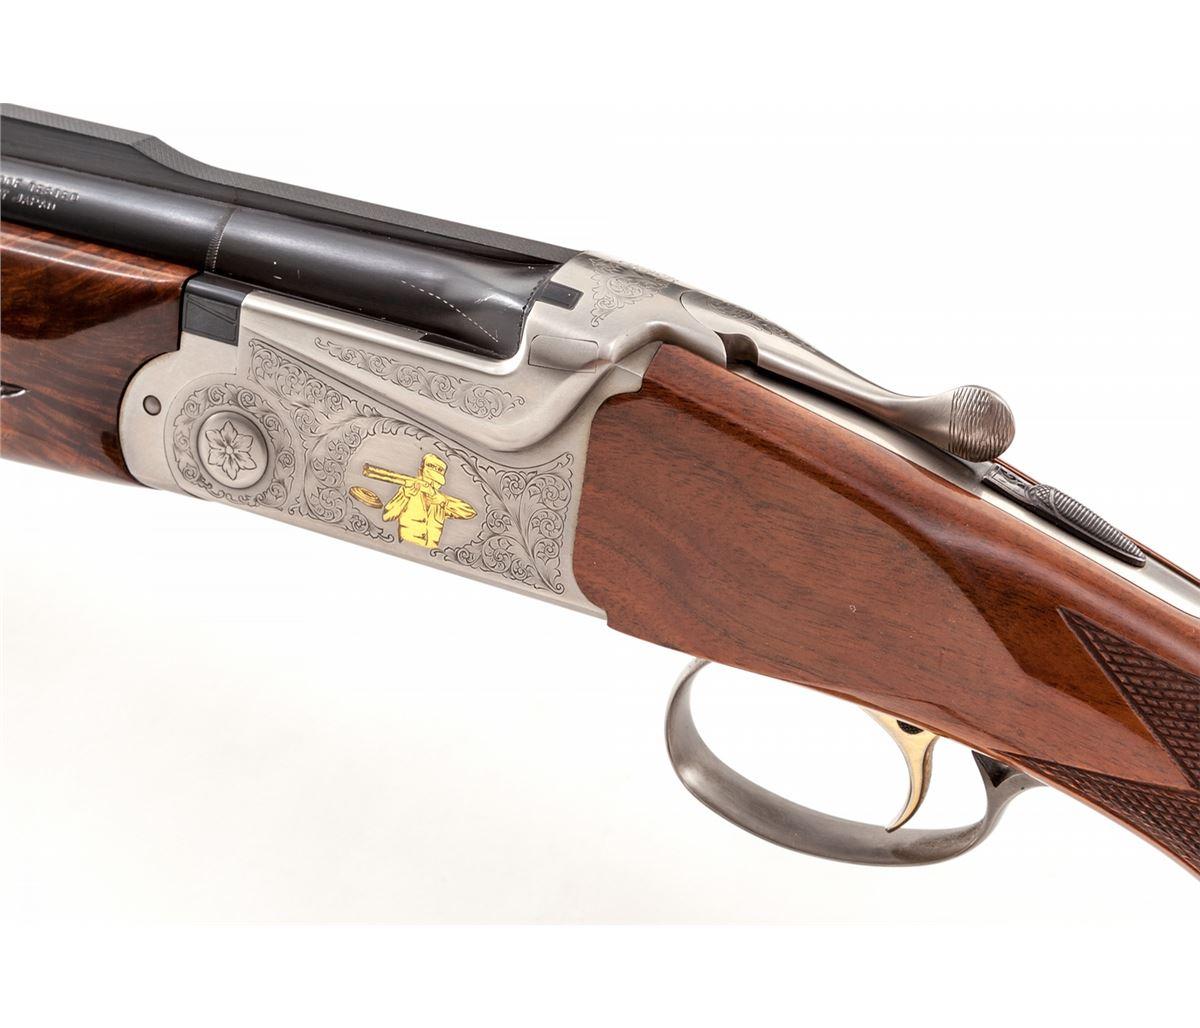 SKB Arms Trap Grade Model 685 O/U Shotgun